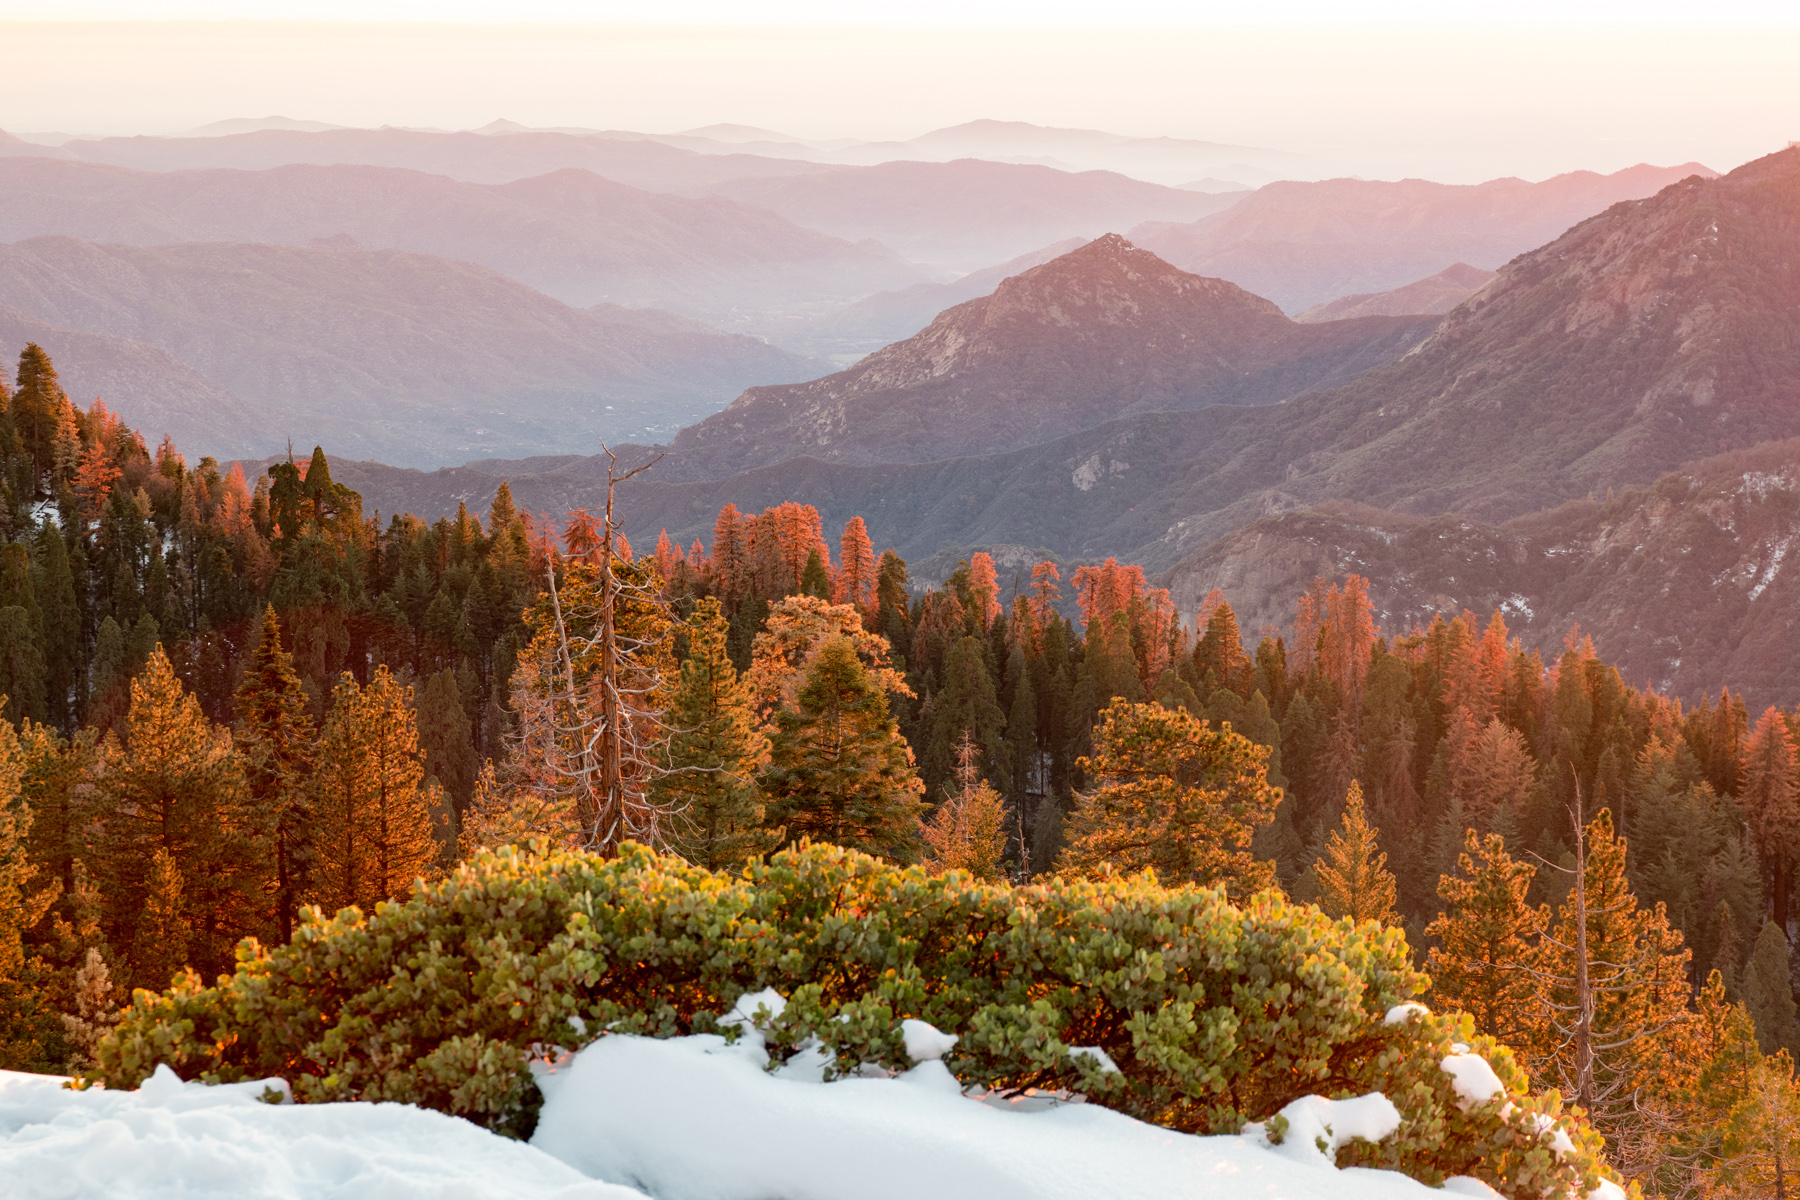 Wasim Muklashy Photography_Sequoia National Park_California_December 2015_-SAM_4182.jpg